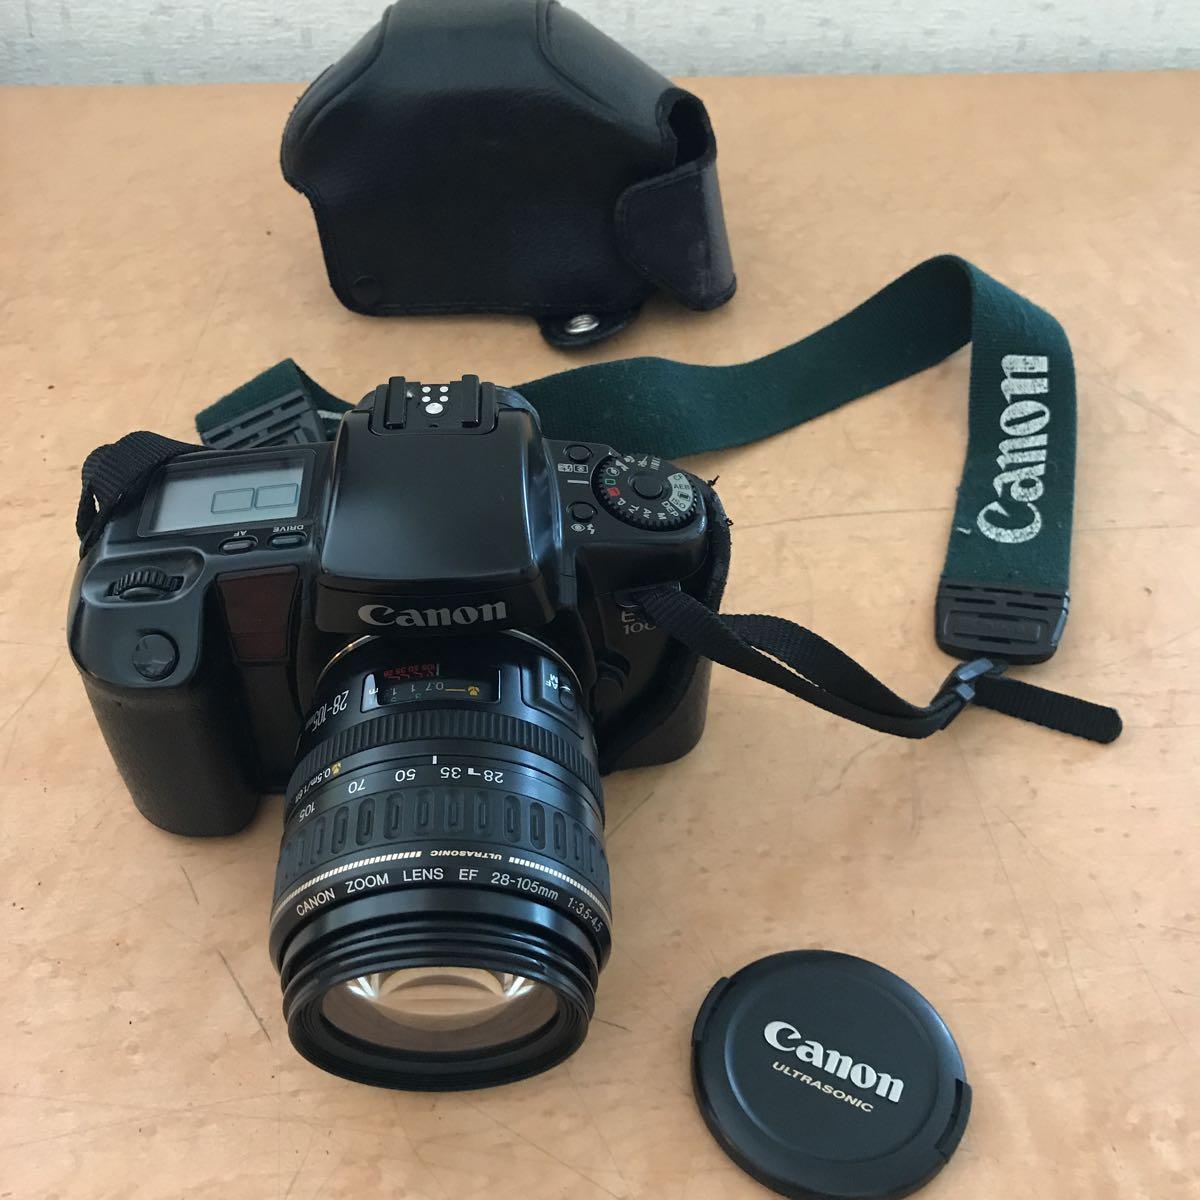 ☆【CANON】キャノン EOS100QD EF 28-105mm 1:3.5-4.5☆